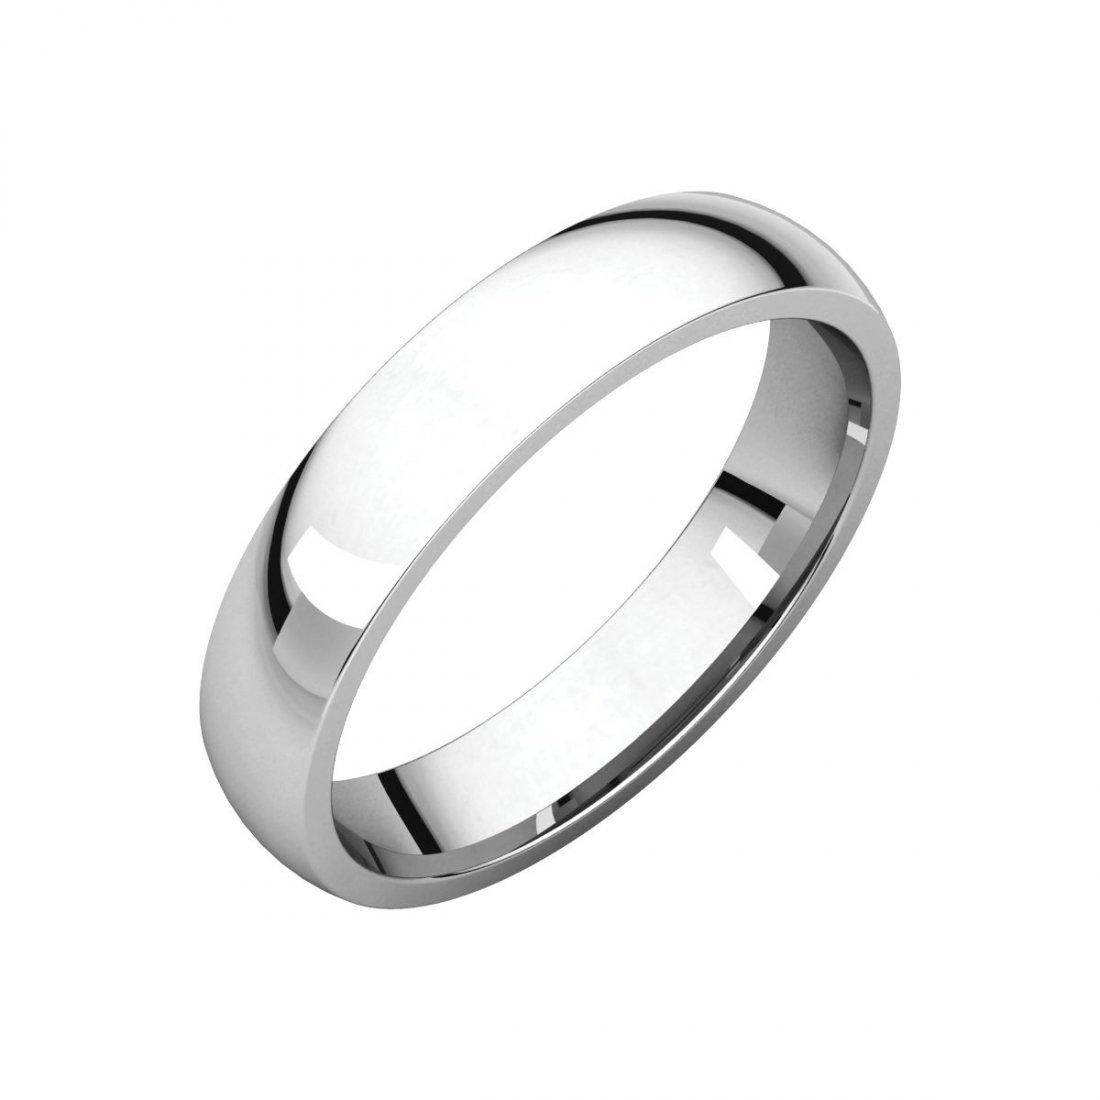 Ring - 14k White Gold 4mm Light Comfort Fit Band